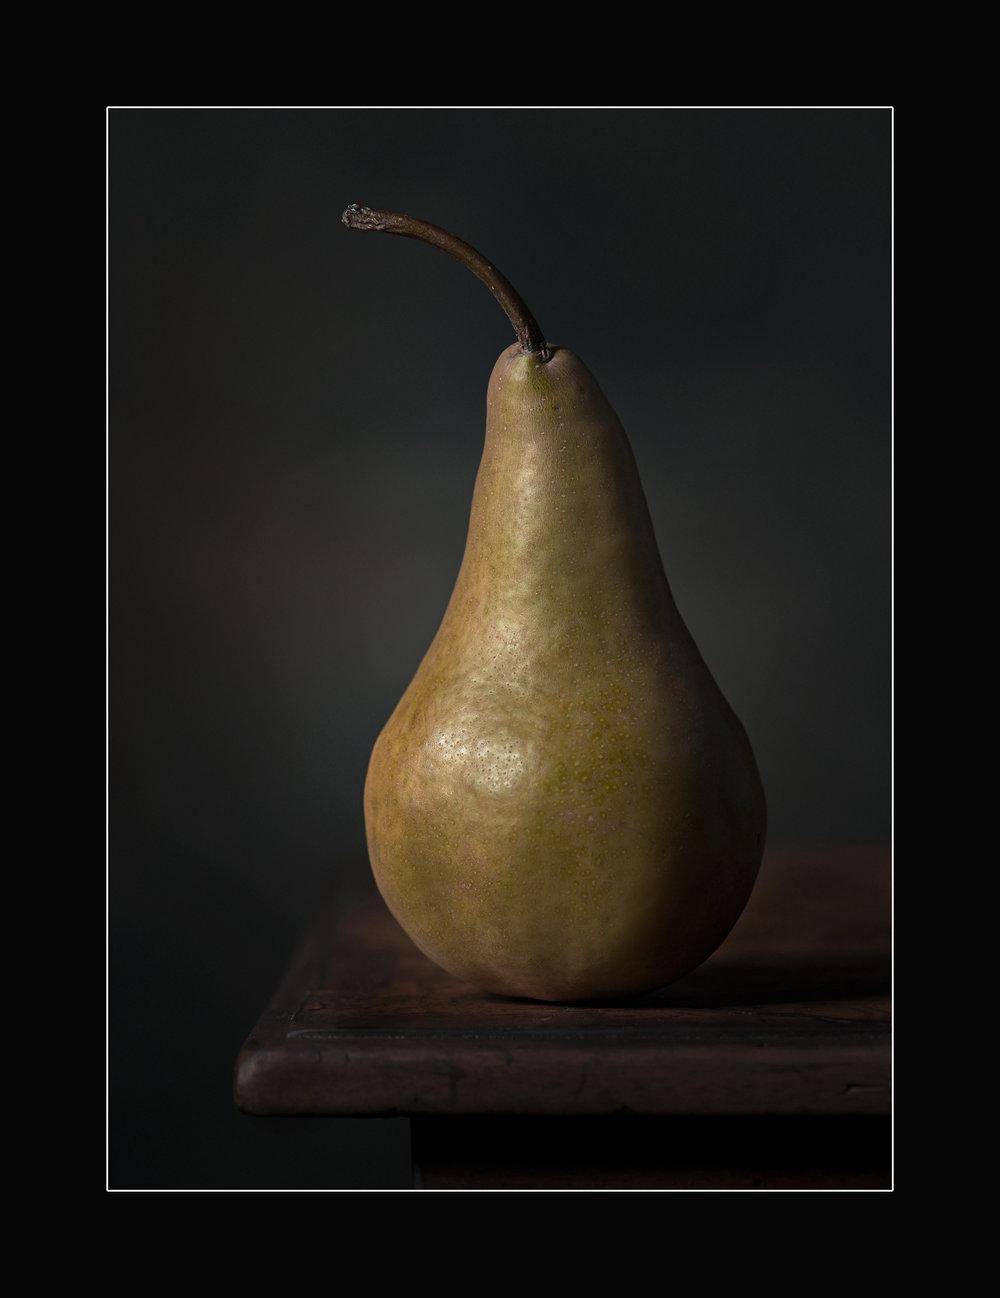 Pear_SQUARE7.jpg